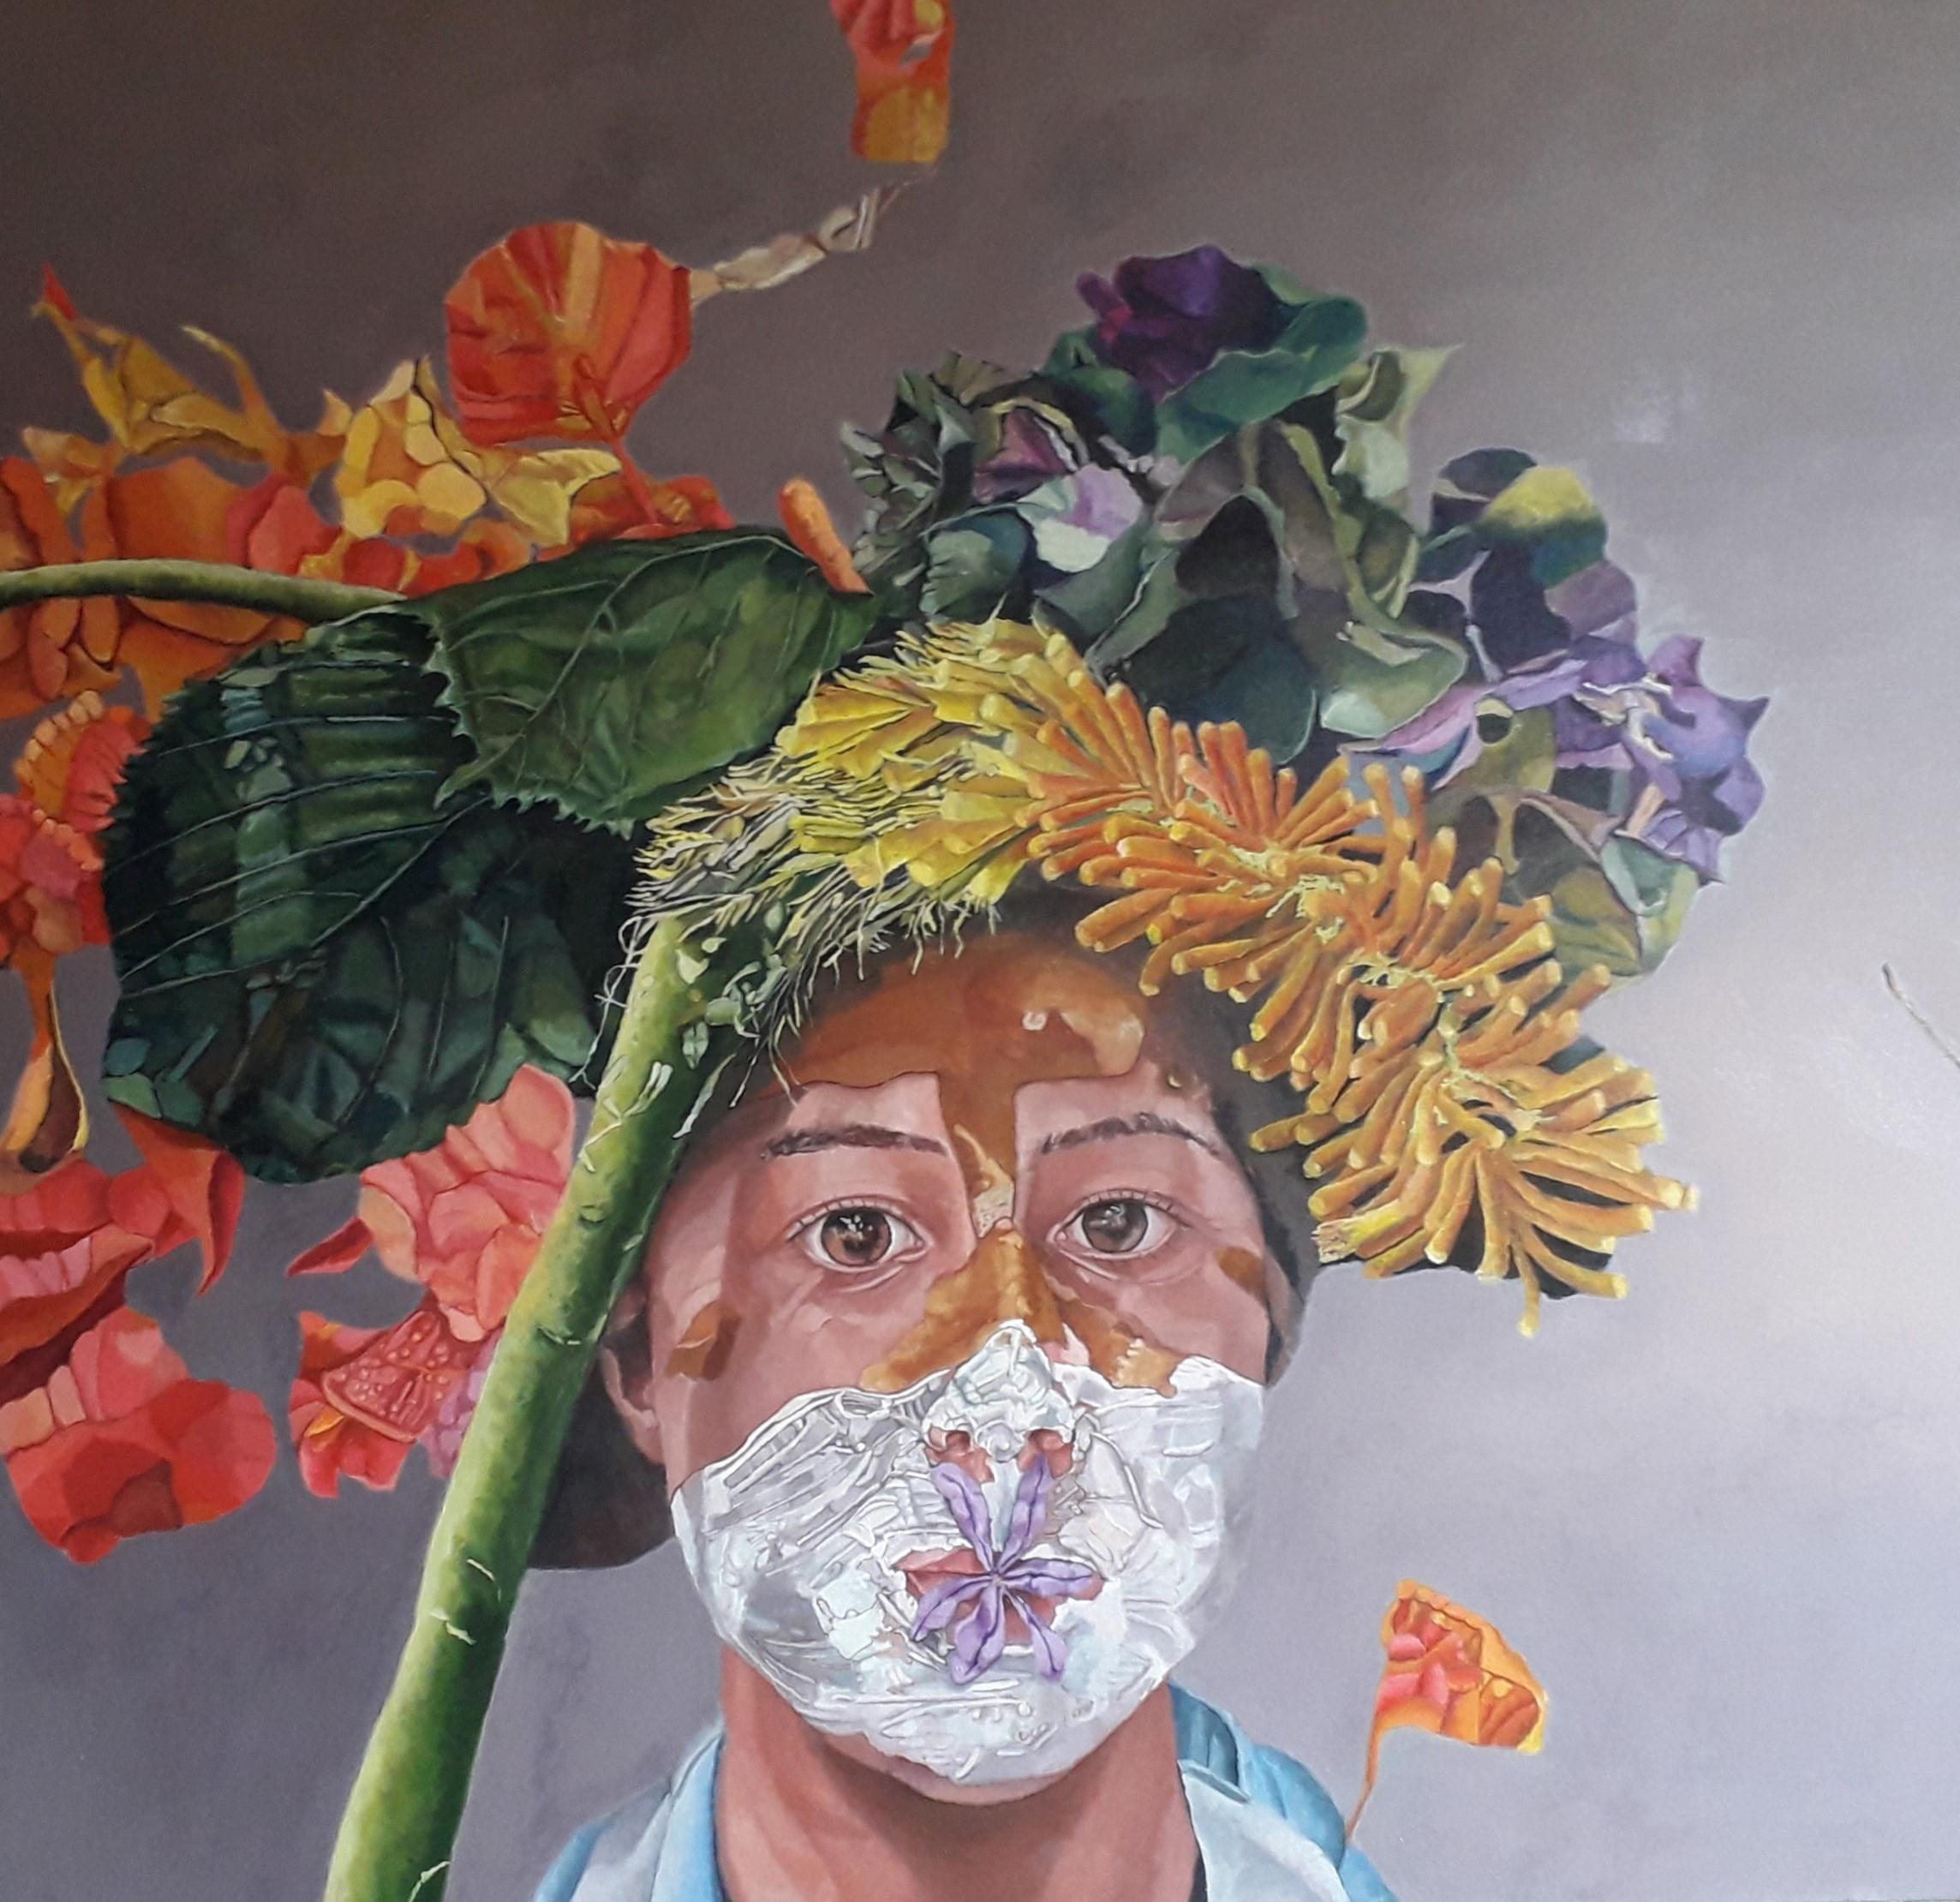 Colombian artist María Peña's art work